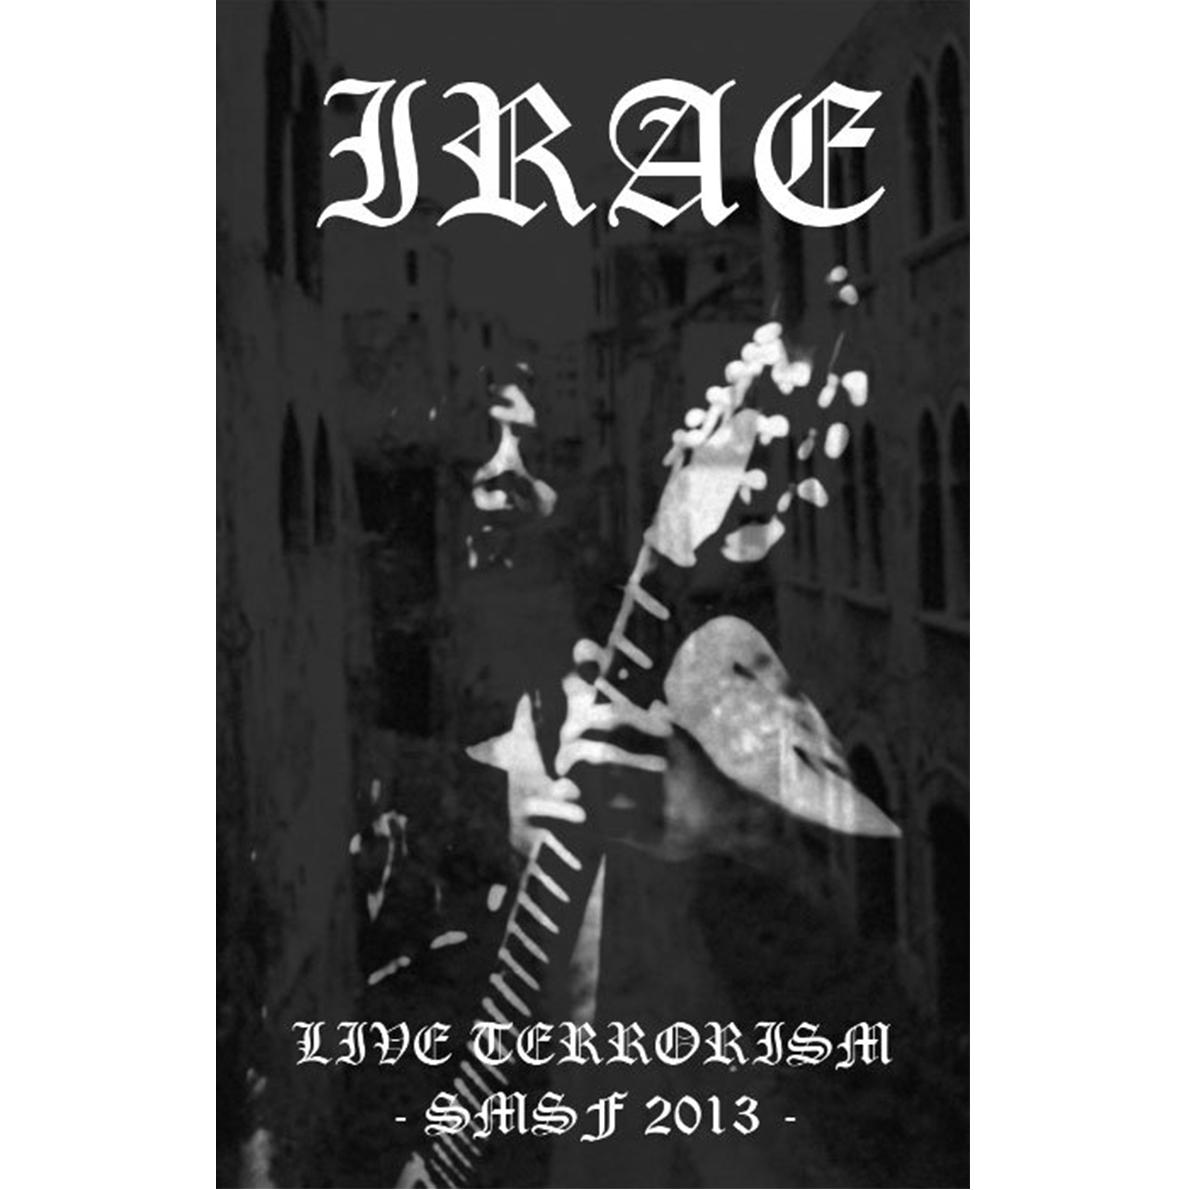 IRAE - Live Terrorism